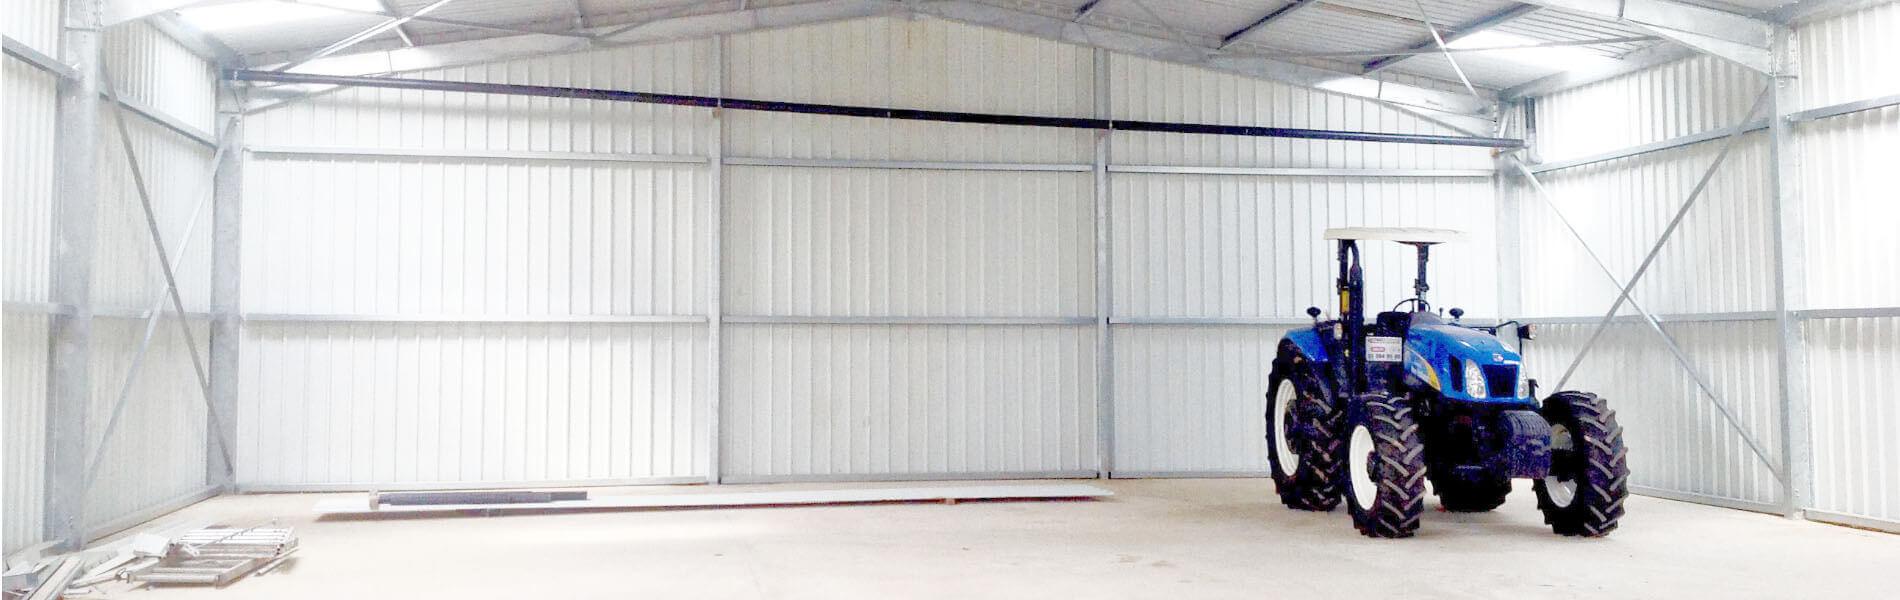 hangar-agricole-interieur